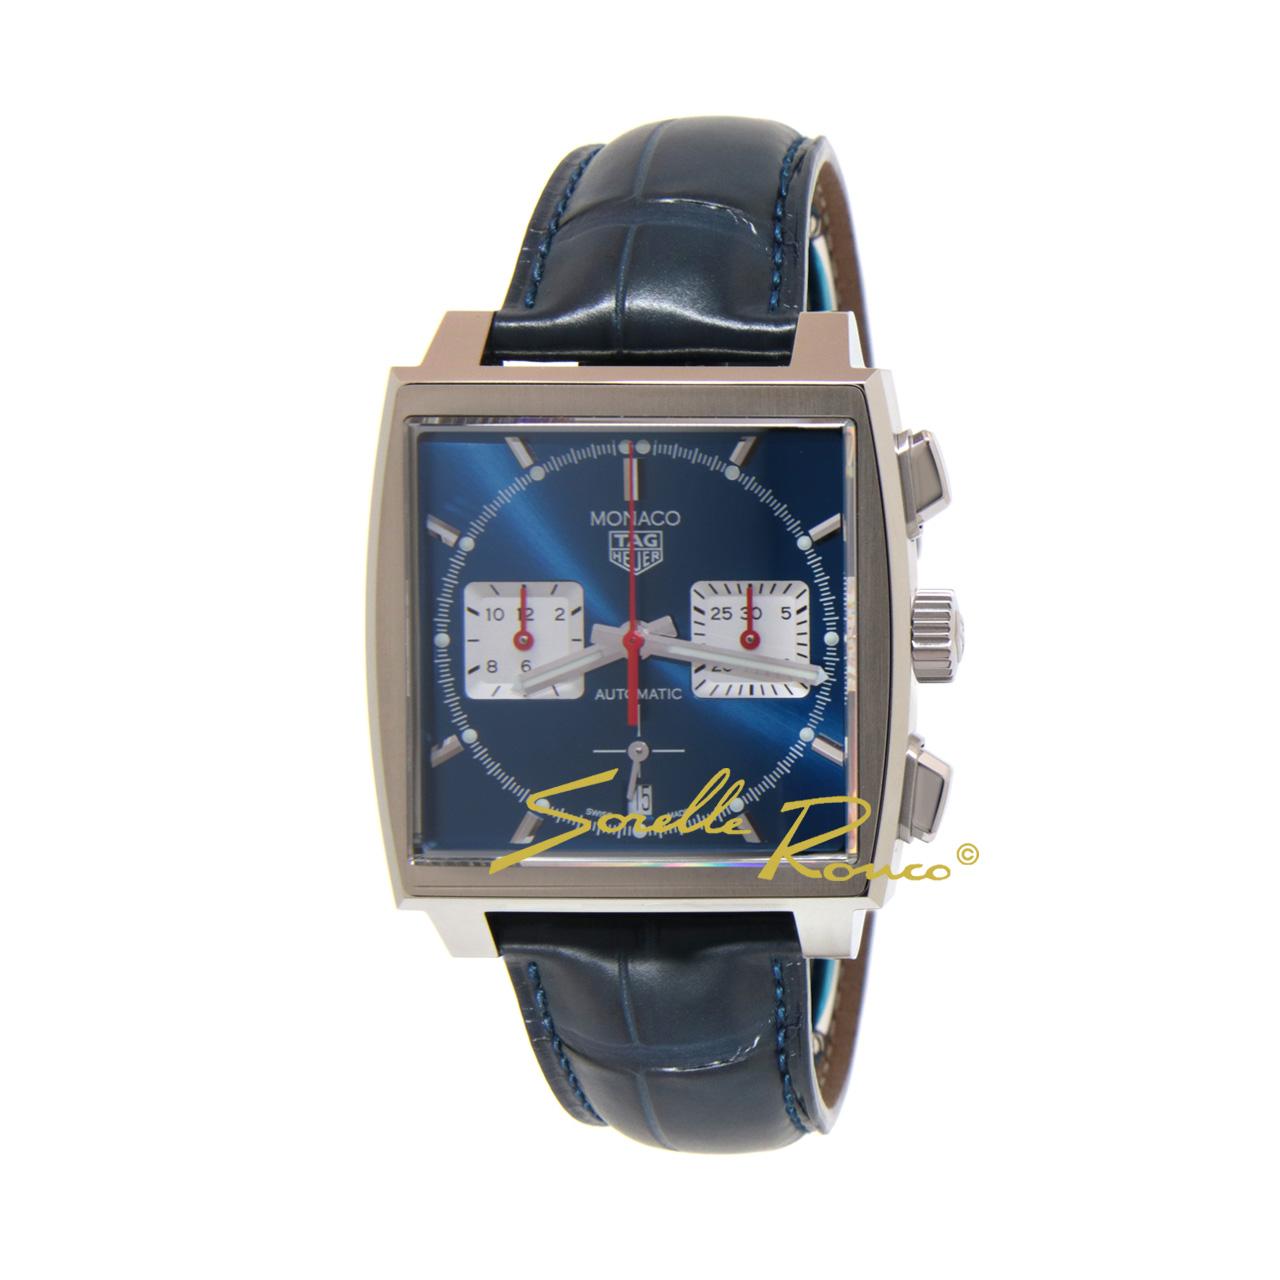 Monaco Chronograph Blu Calibre Heuer 02